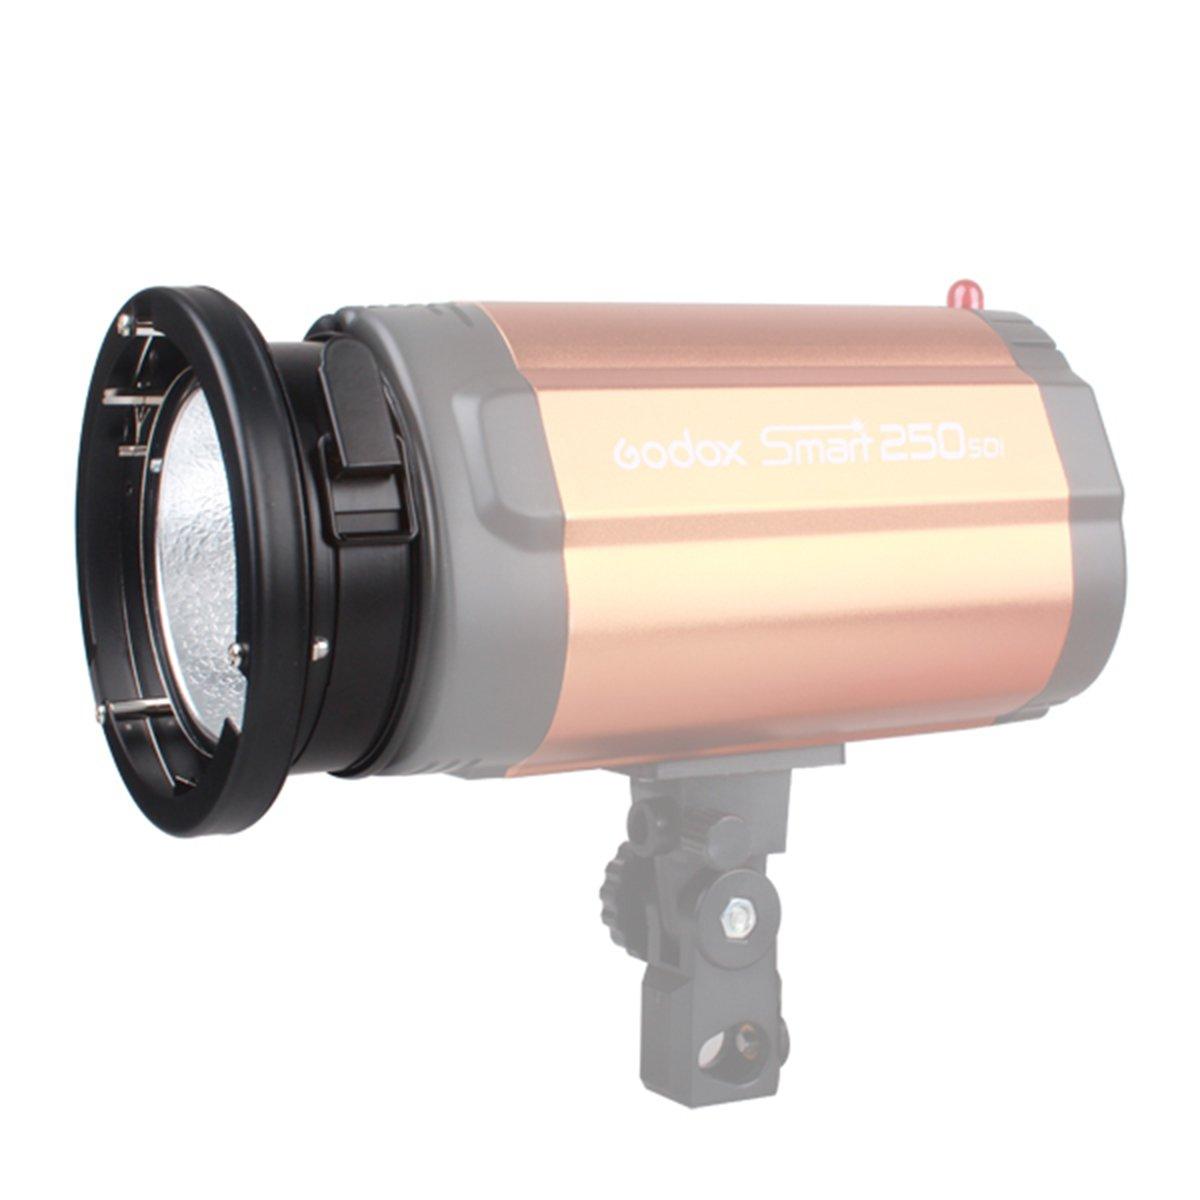 Godox 98mm Universal Mount To Bowens Mounts Speedring Adapter Studio Flash Strobe for Godox K150A K180A 250DI 300DI 250SDI by Godox (Image #2)